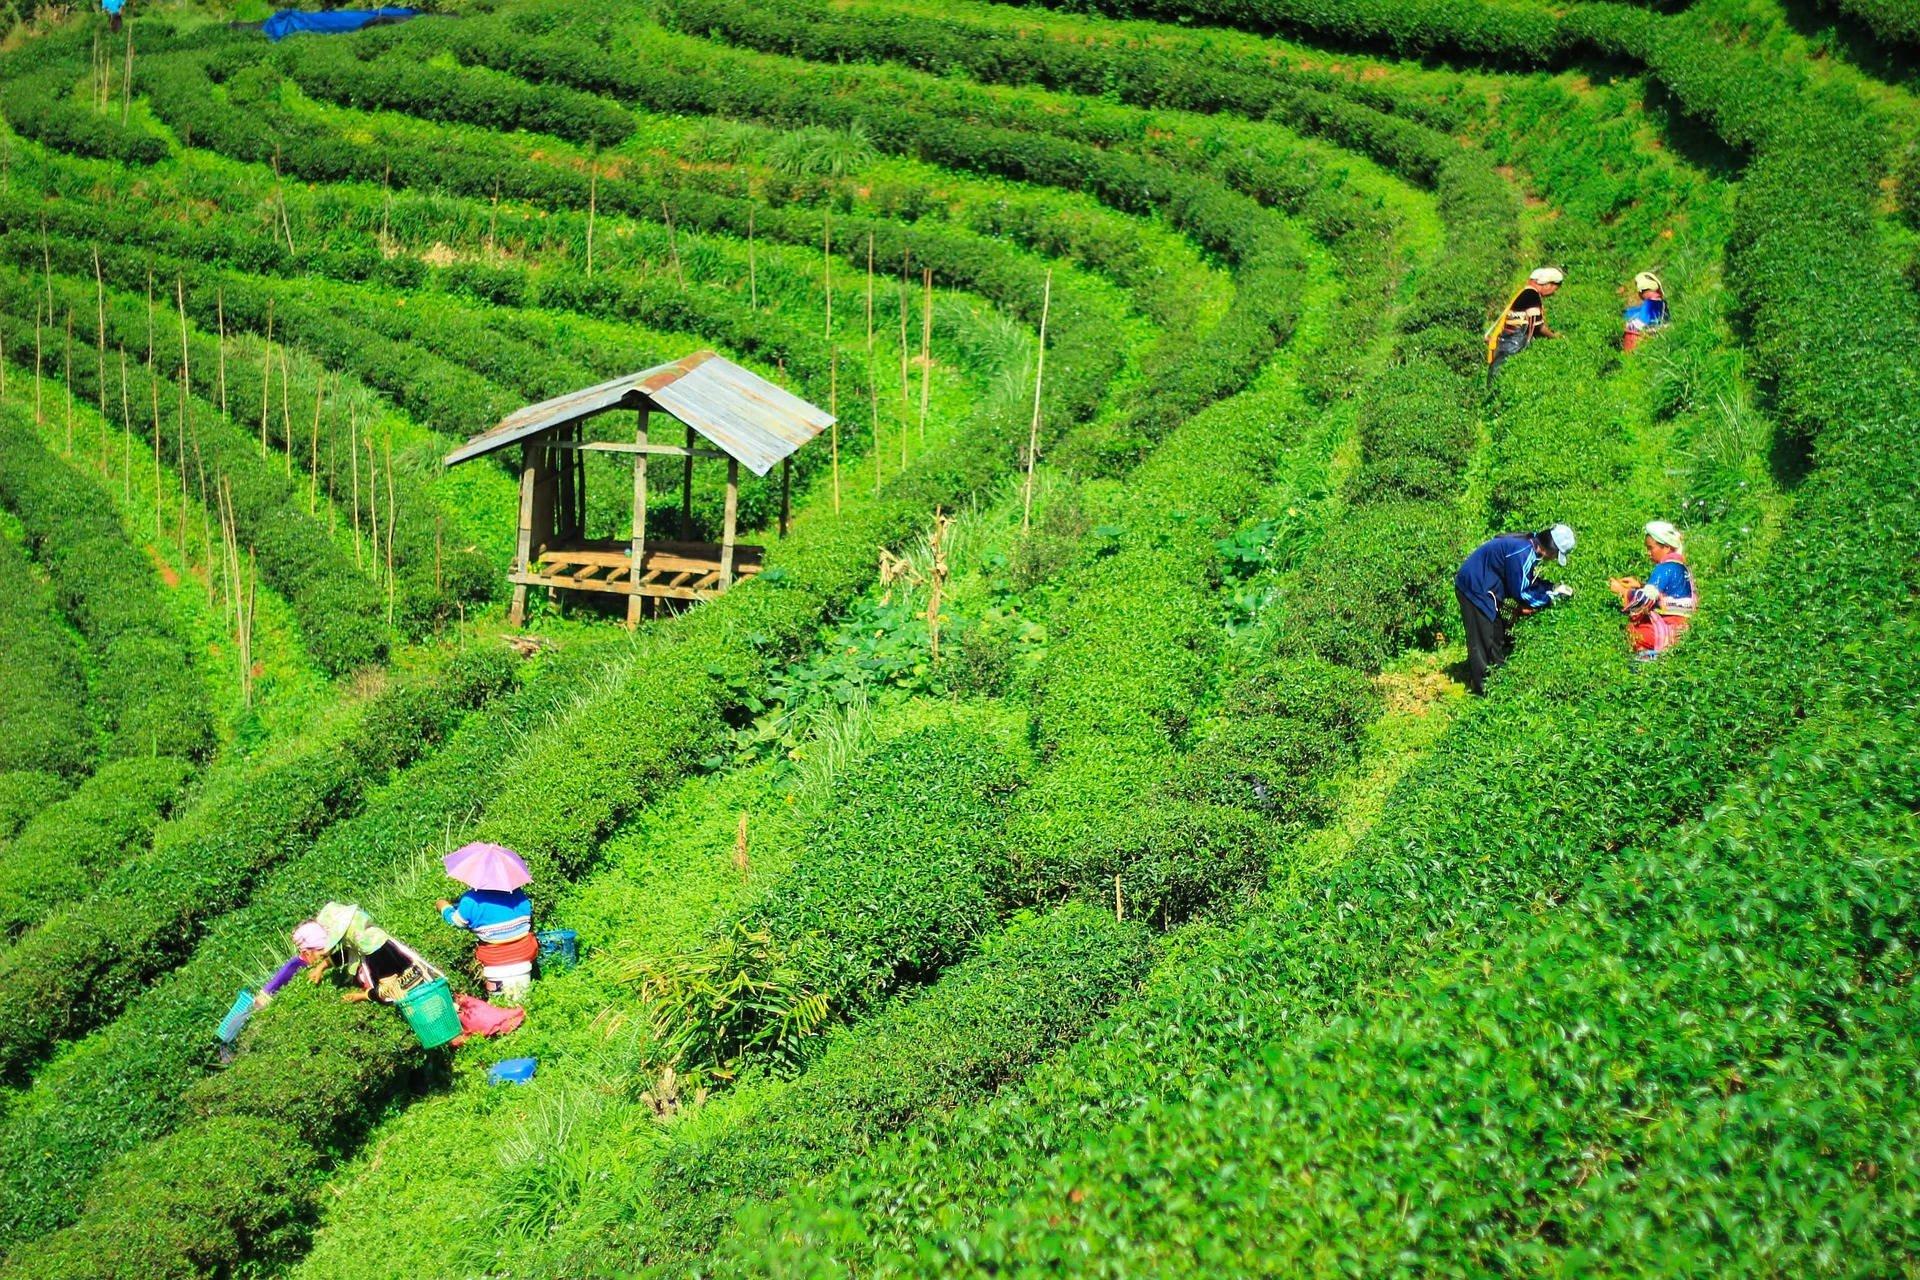 Tea plantation Chiang Mai, Thailand